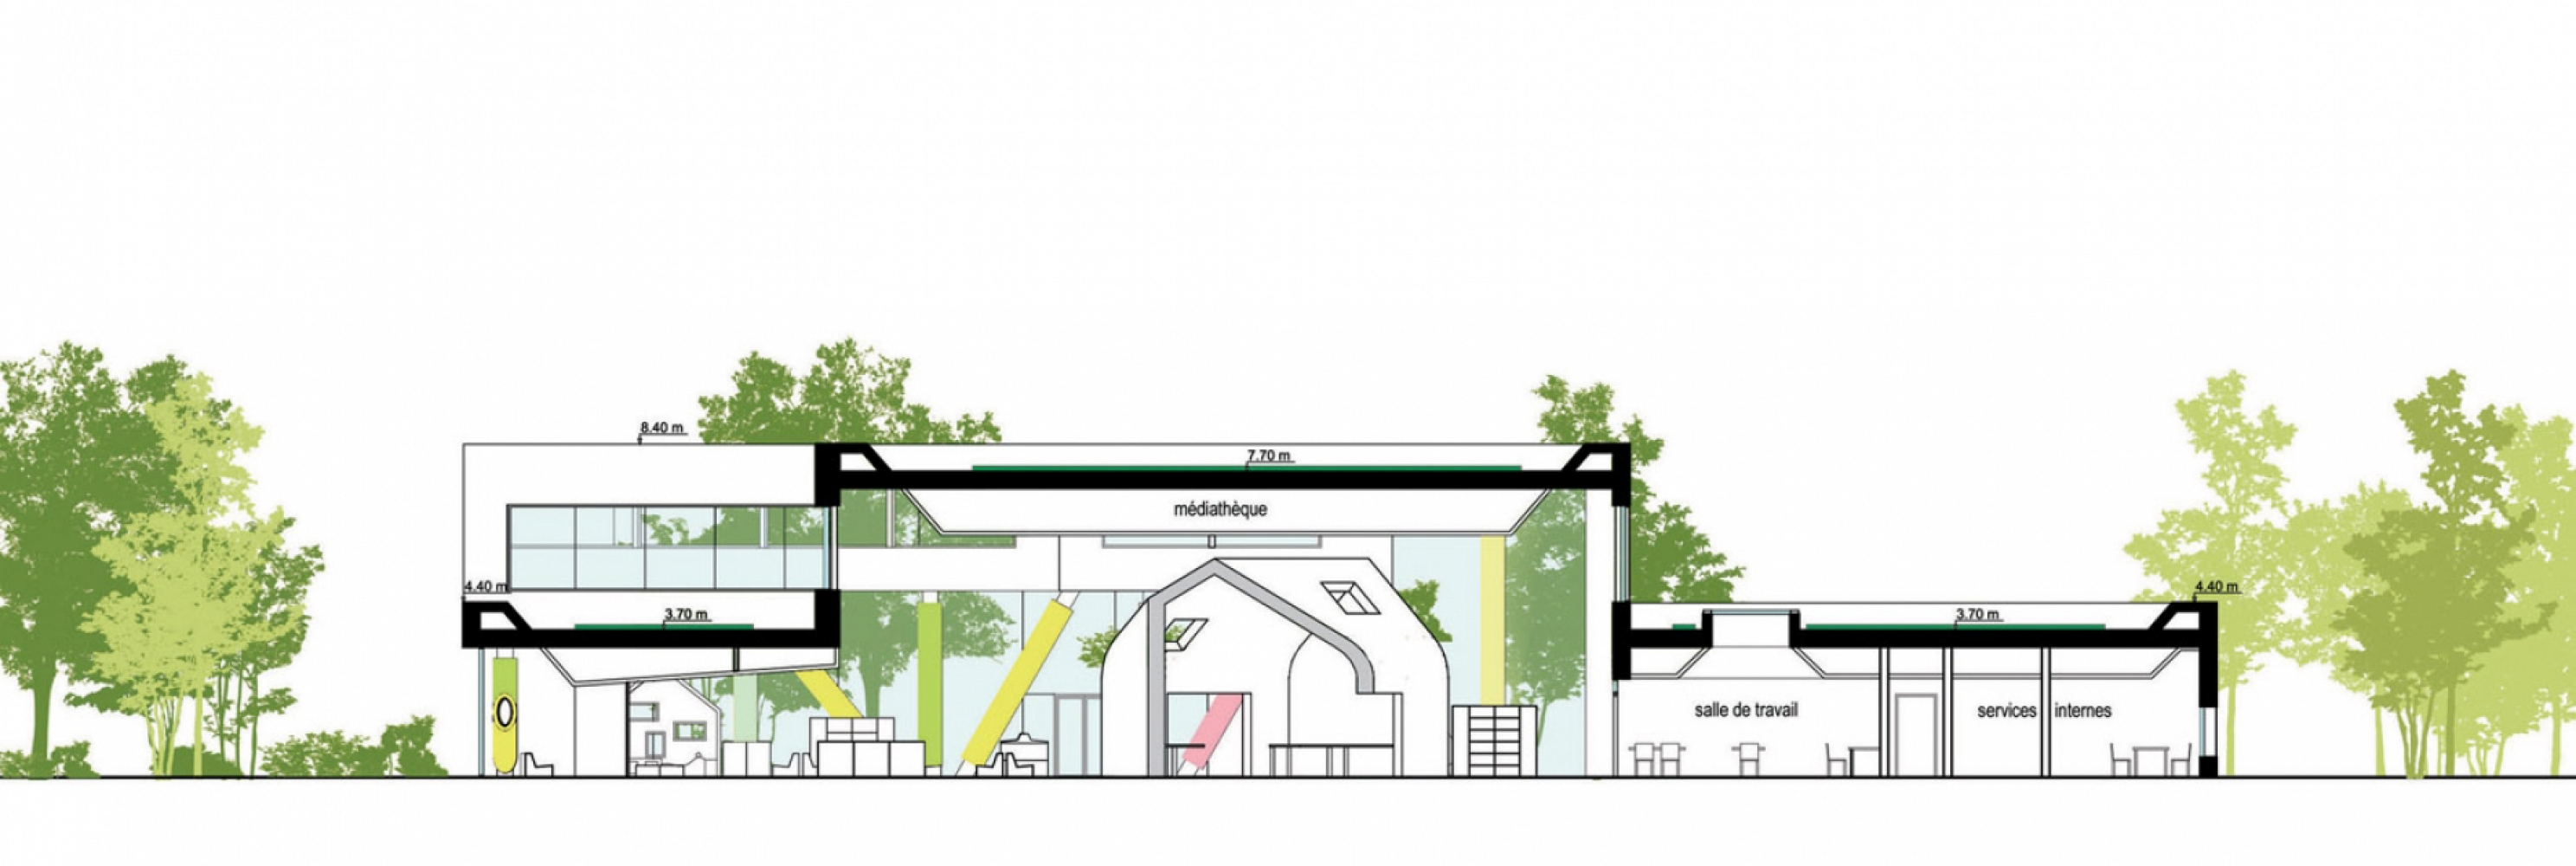 harnes01 Pascale SEURIN Architecte - Culturel